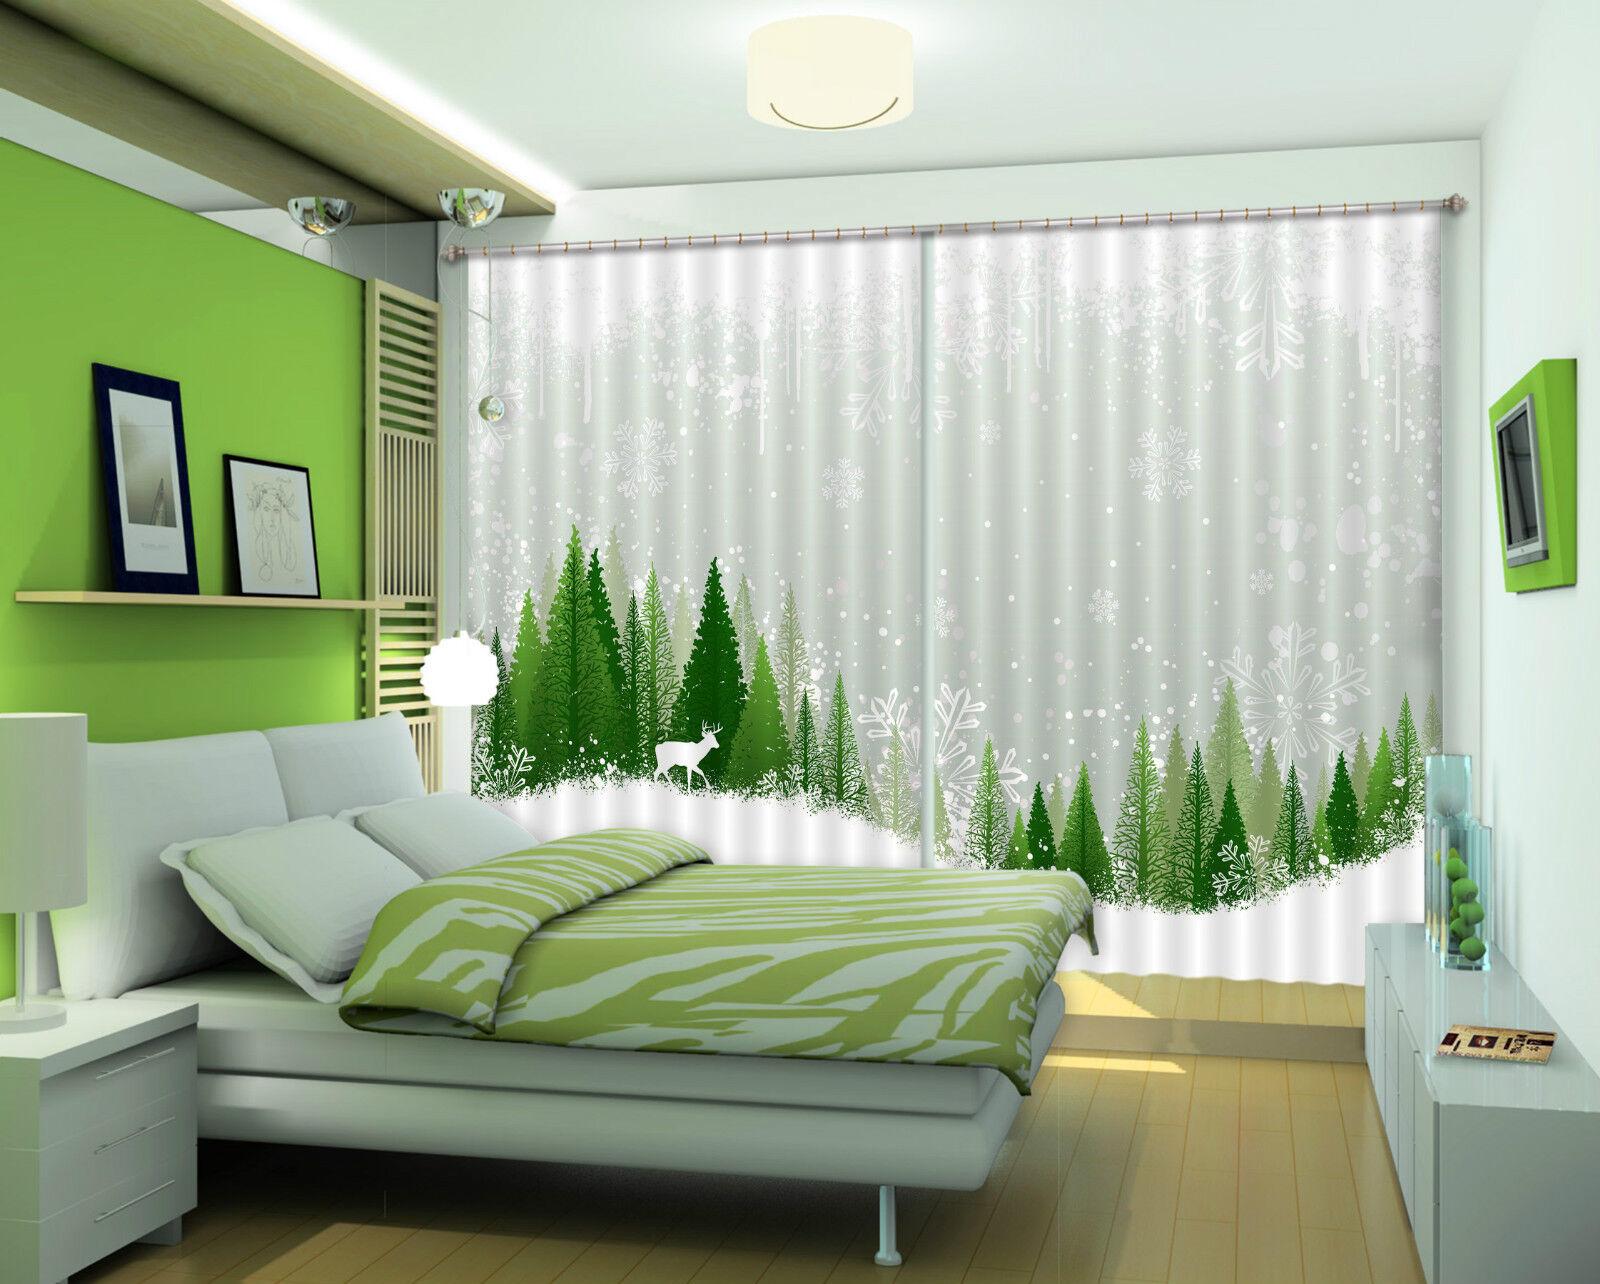 3d nieve árbol 427 bloqueo foto cortina cortina de impresión sustancia cortinas de ventana